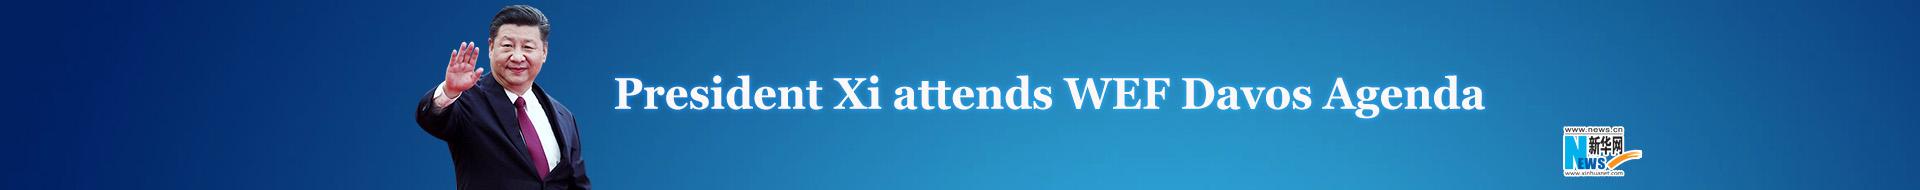 President Xi attends WEF Davos Agenda